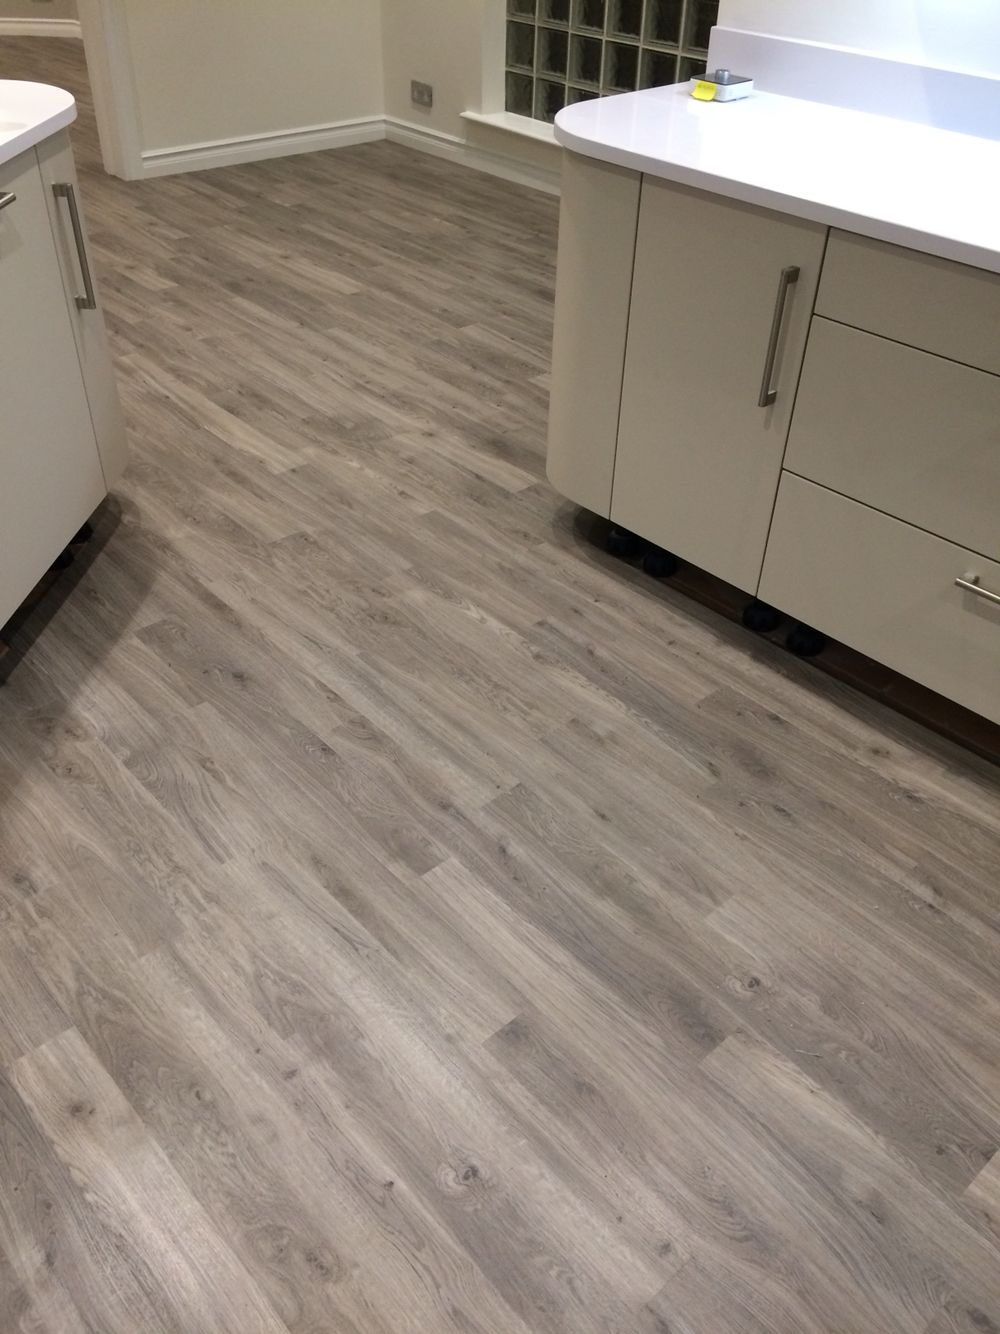 Pin By Annetsider On Home In 2020 Amtico Flooring Amtico